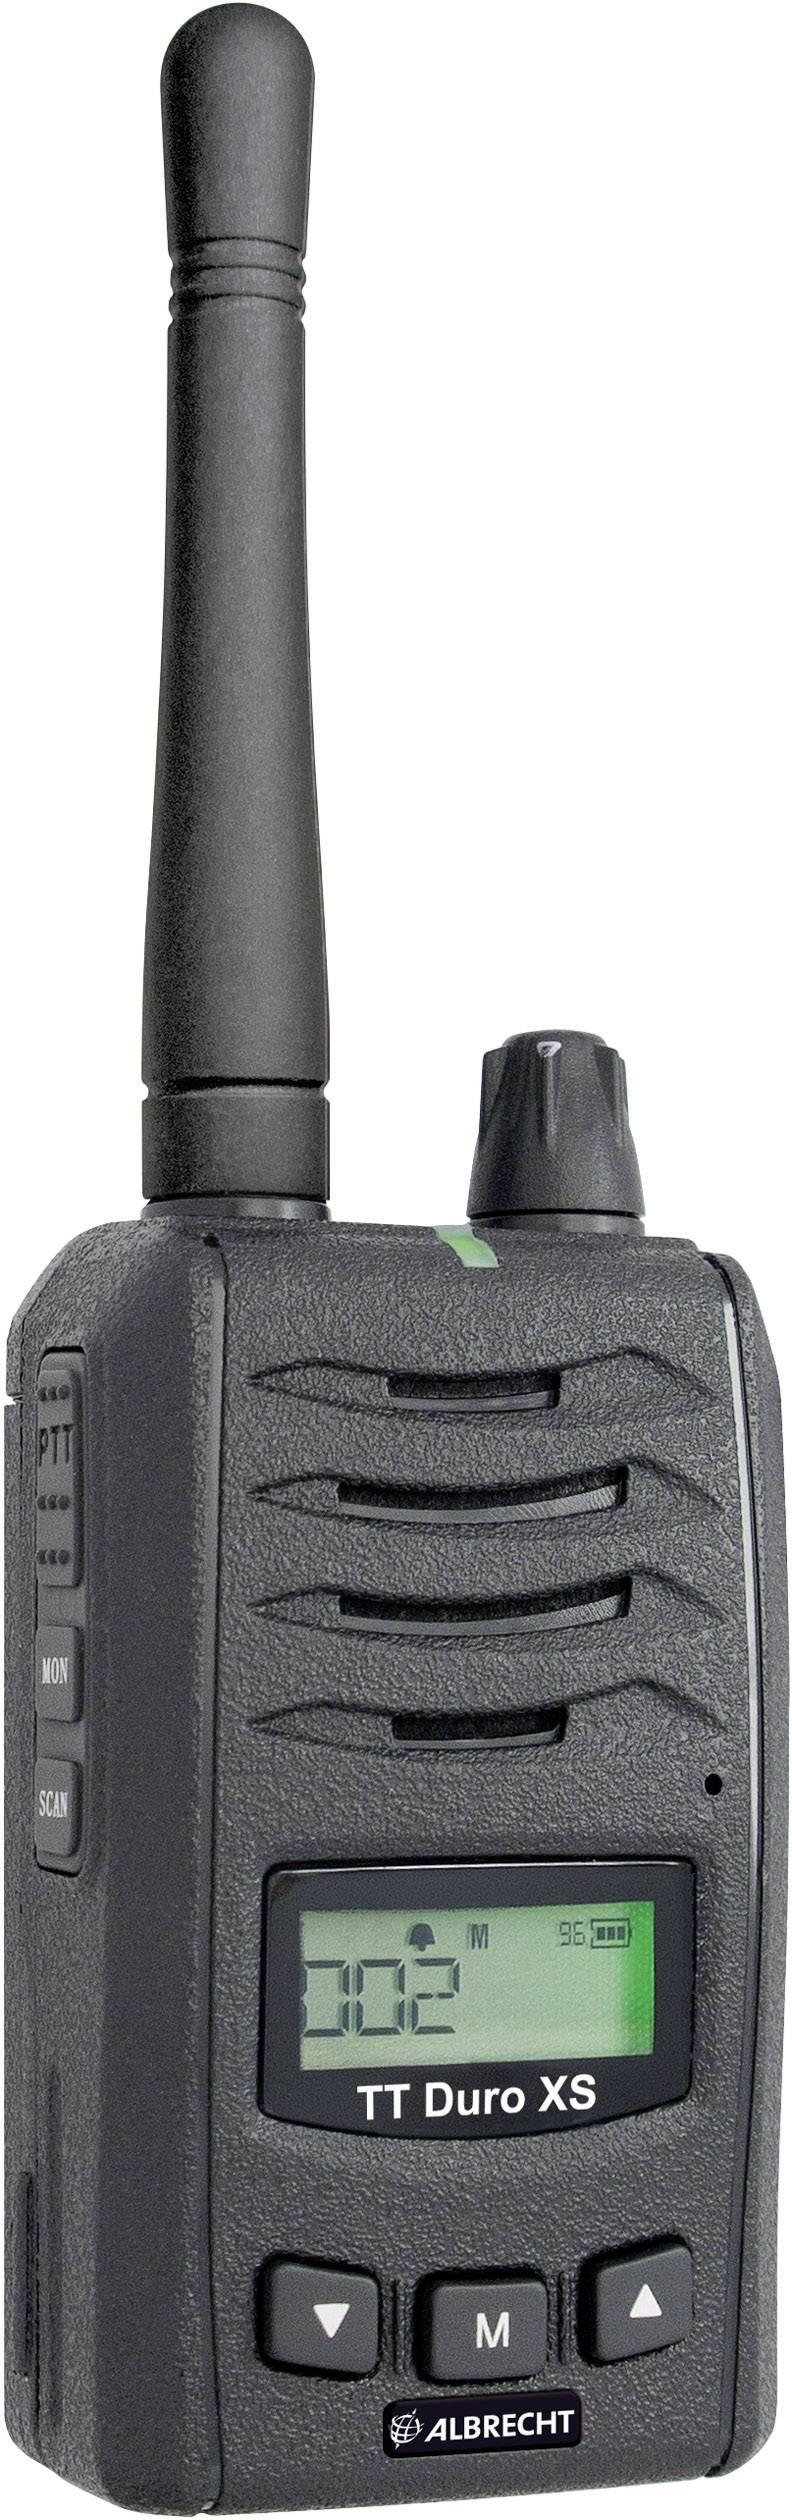 PMR rádiostanica Albrecht ALBRECHT Tectalk Duro XS 29855